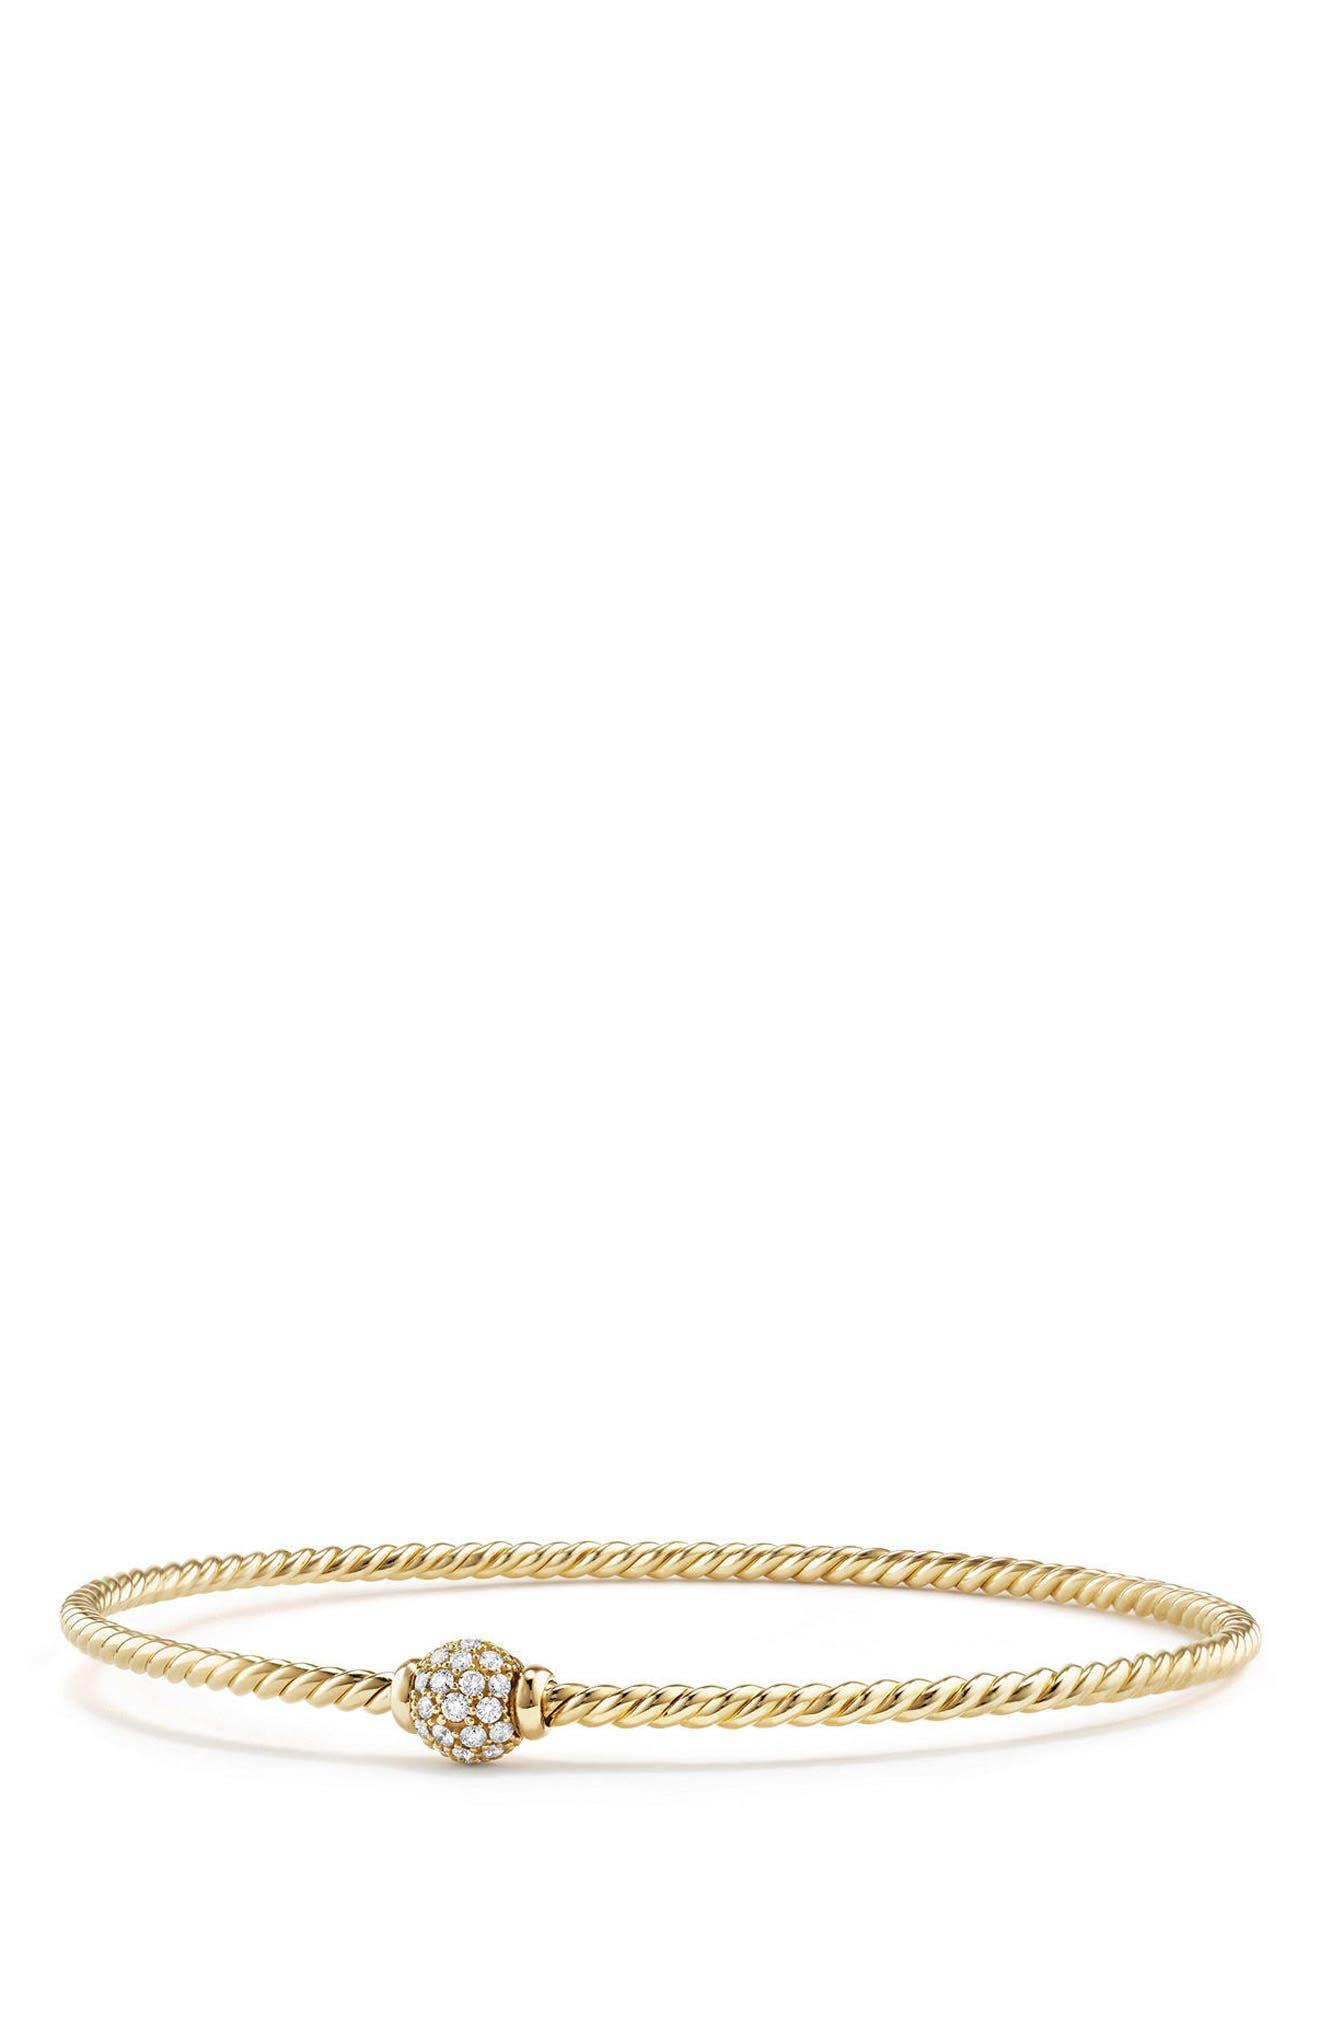 Solari Station Pavé Bracelet with Diamonds in 18K Gold,                             Main thumbnail 1, color,                             YELLOW GOLD/ DIAMOND